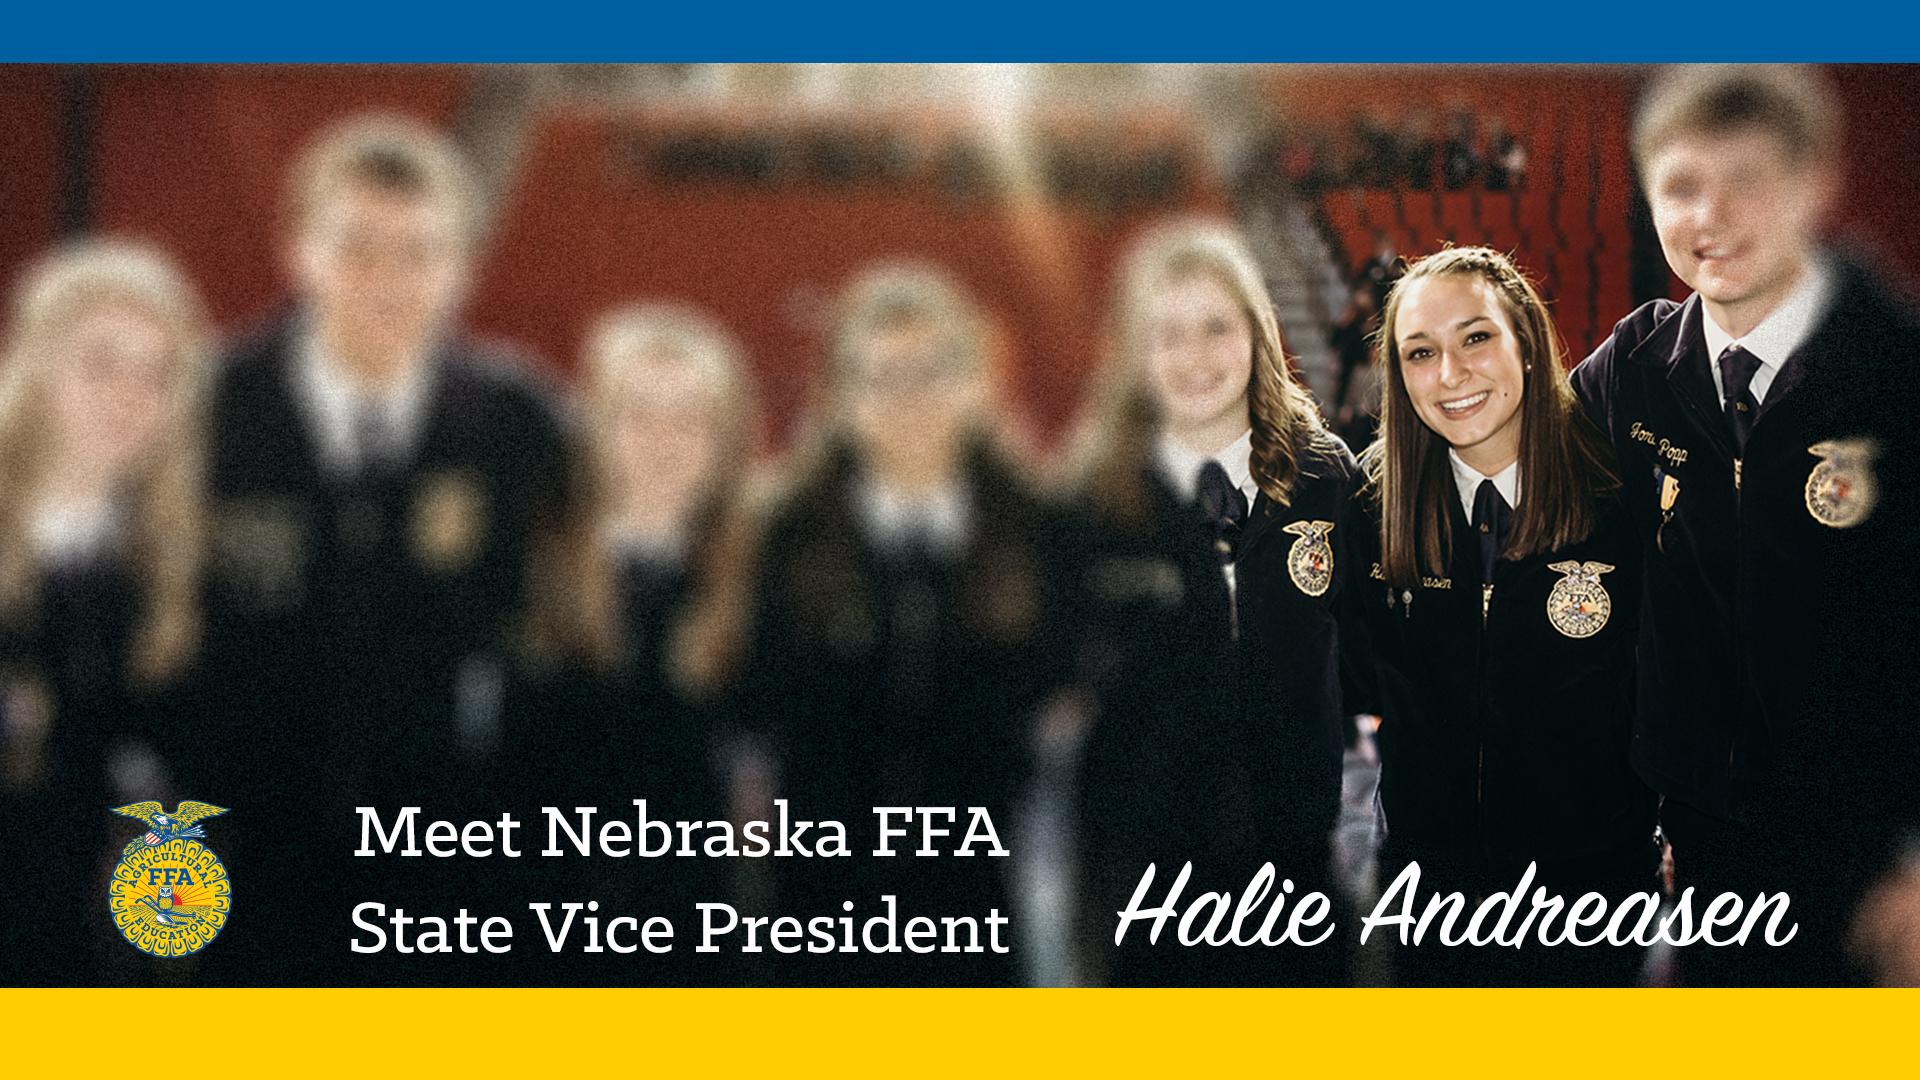 Meet 2018-19 Nebraska FFA Vice President: Halie Andreasen